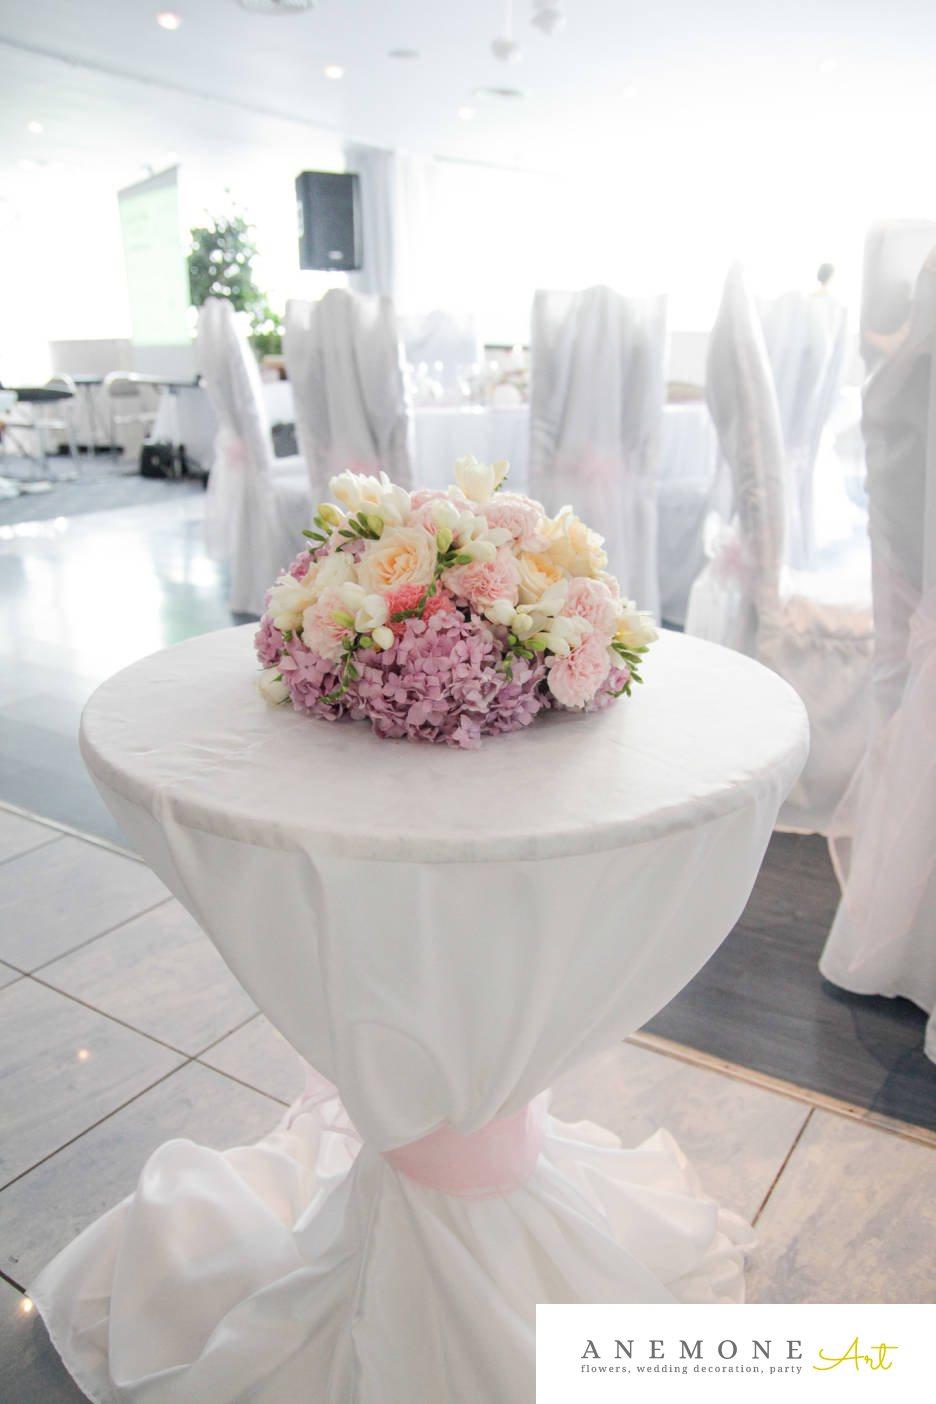 Poza, foto cu Flori de nunta alb, decor masa, frezii, garoafe, roz, trandafiri in Arad, Timisoara, Oradea (wedding flowers, bouquets) nunta Arad, Timisoara, Oradea